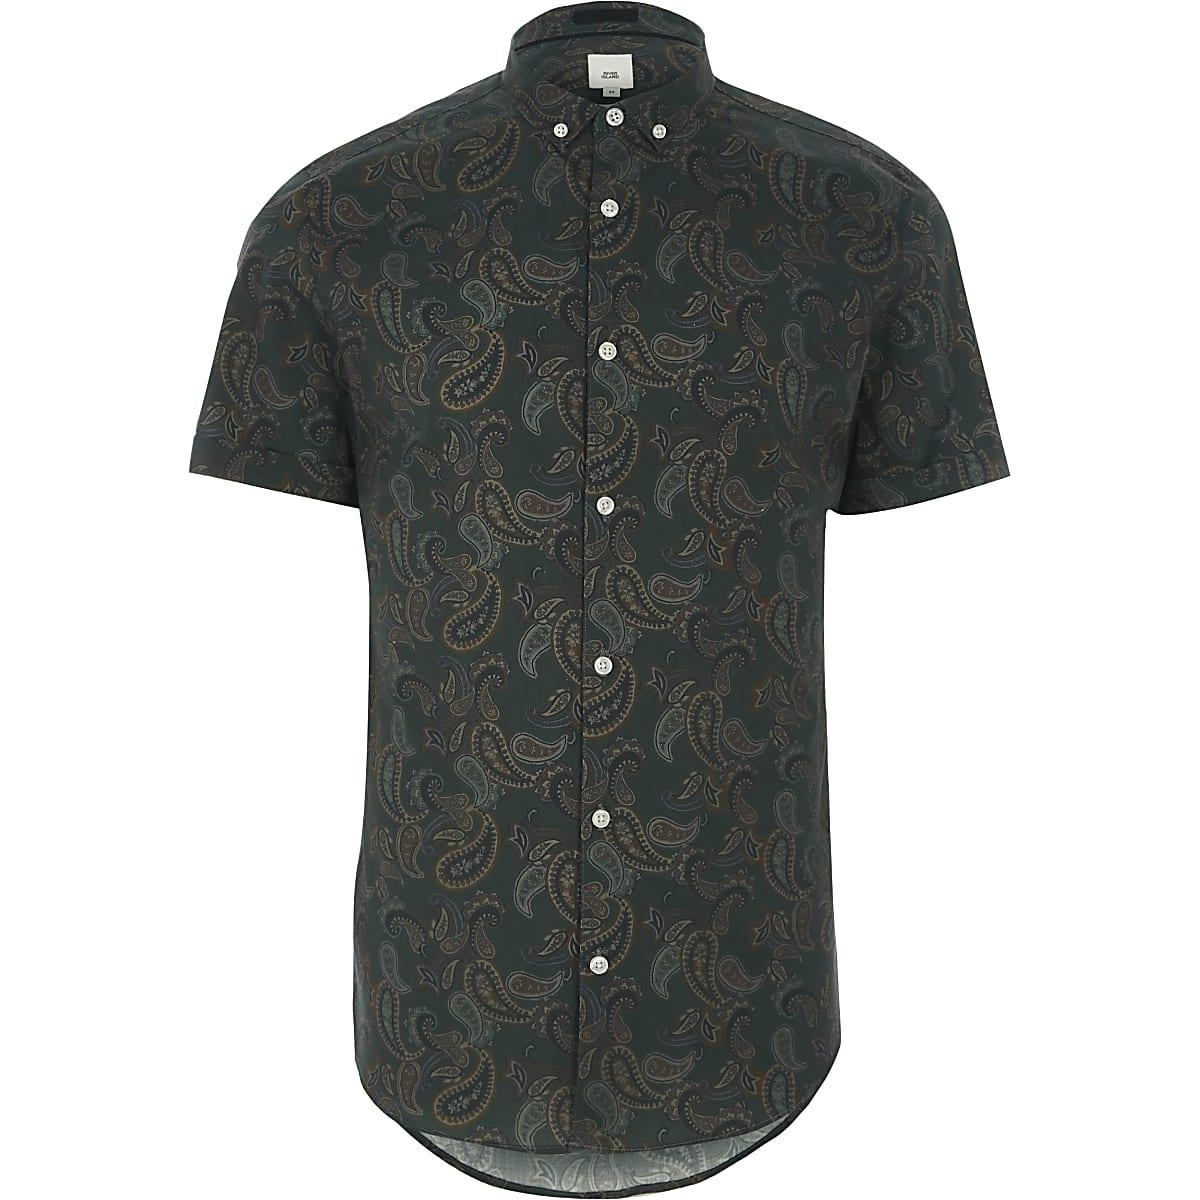 Green paisley print short sleeve shirt